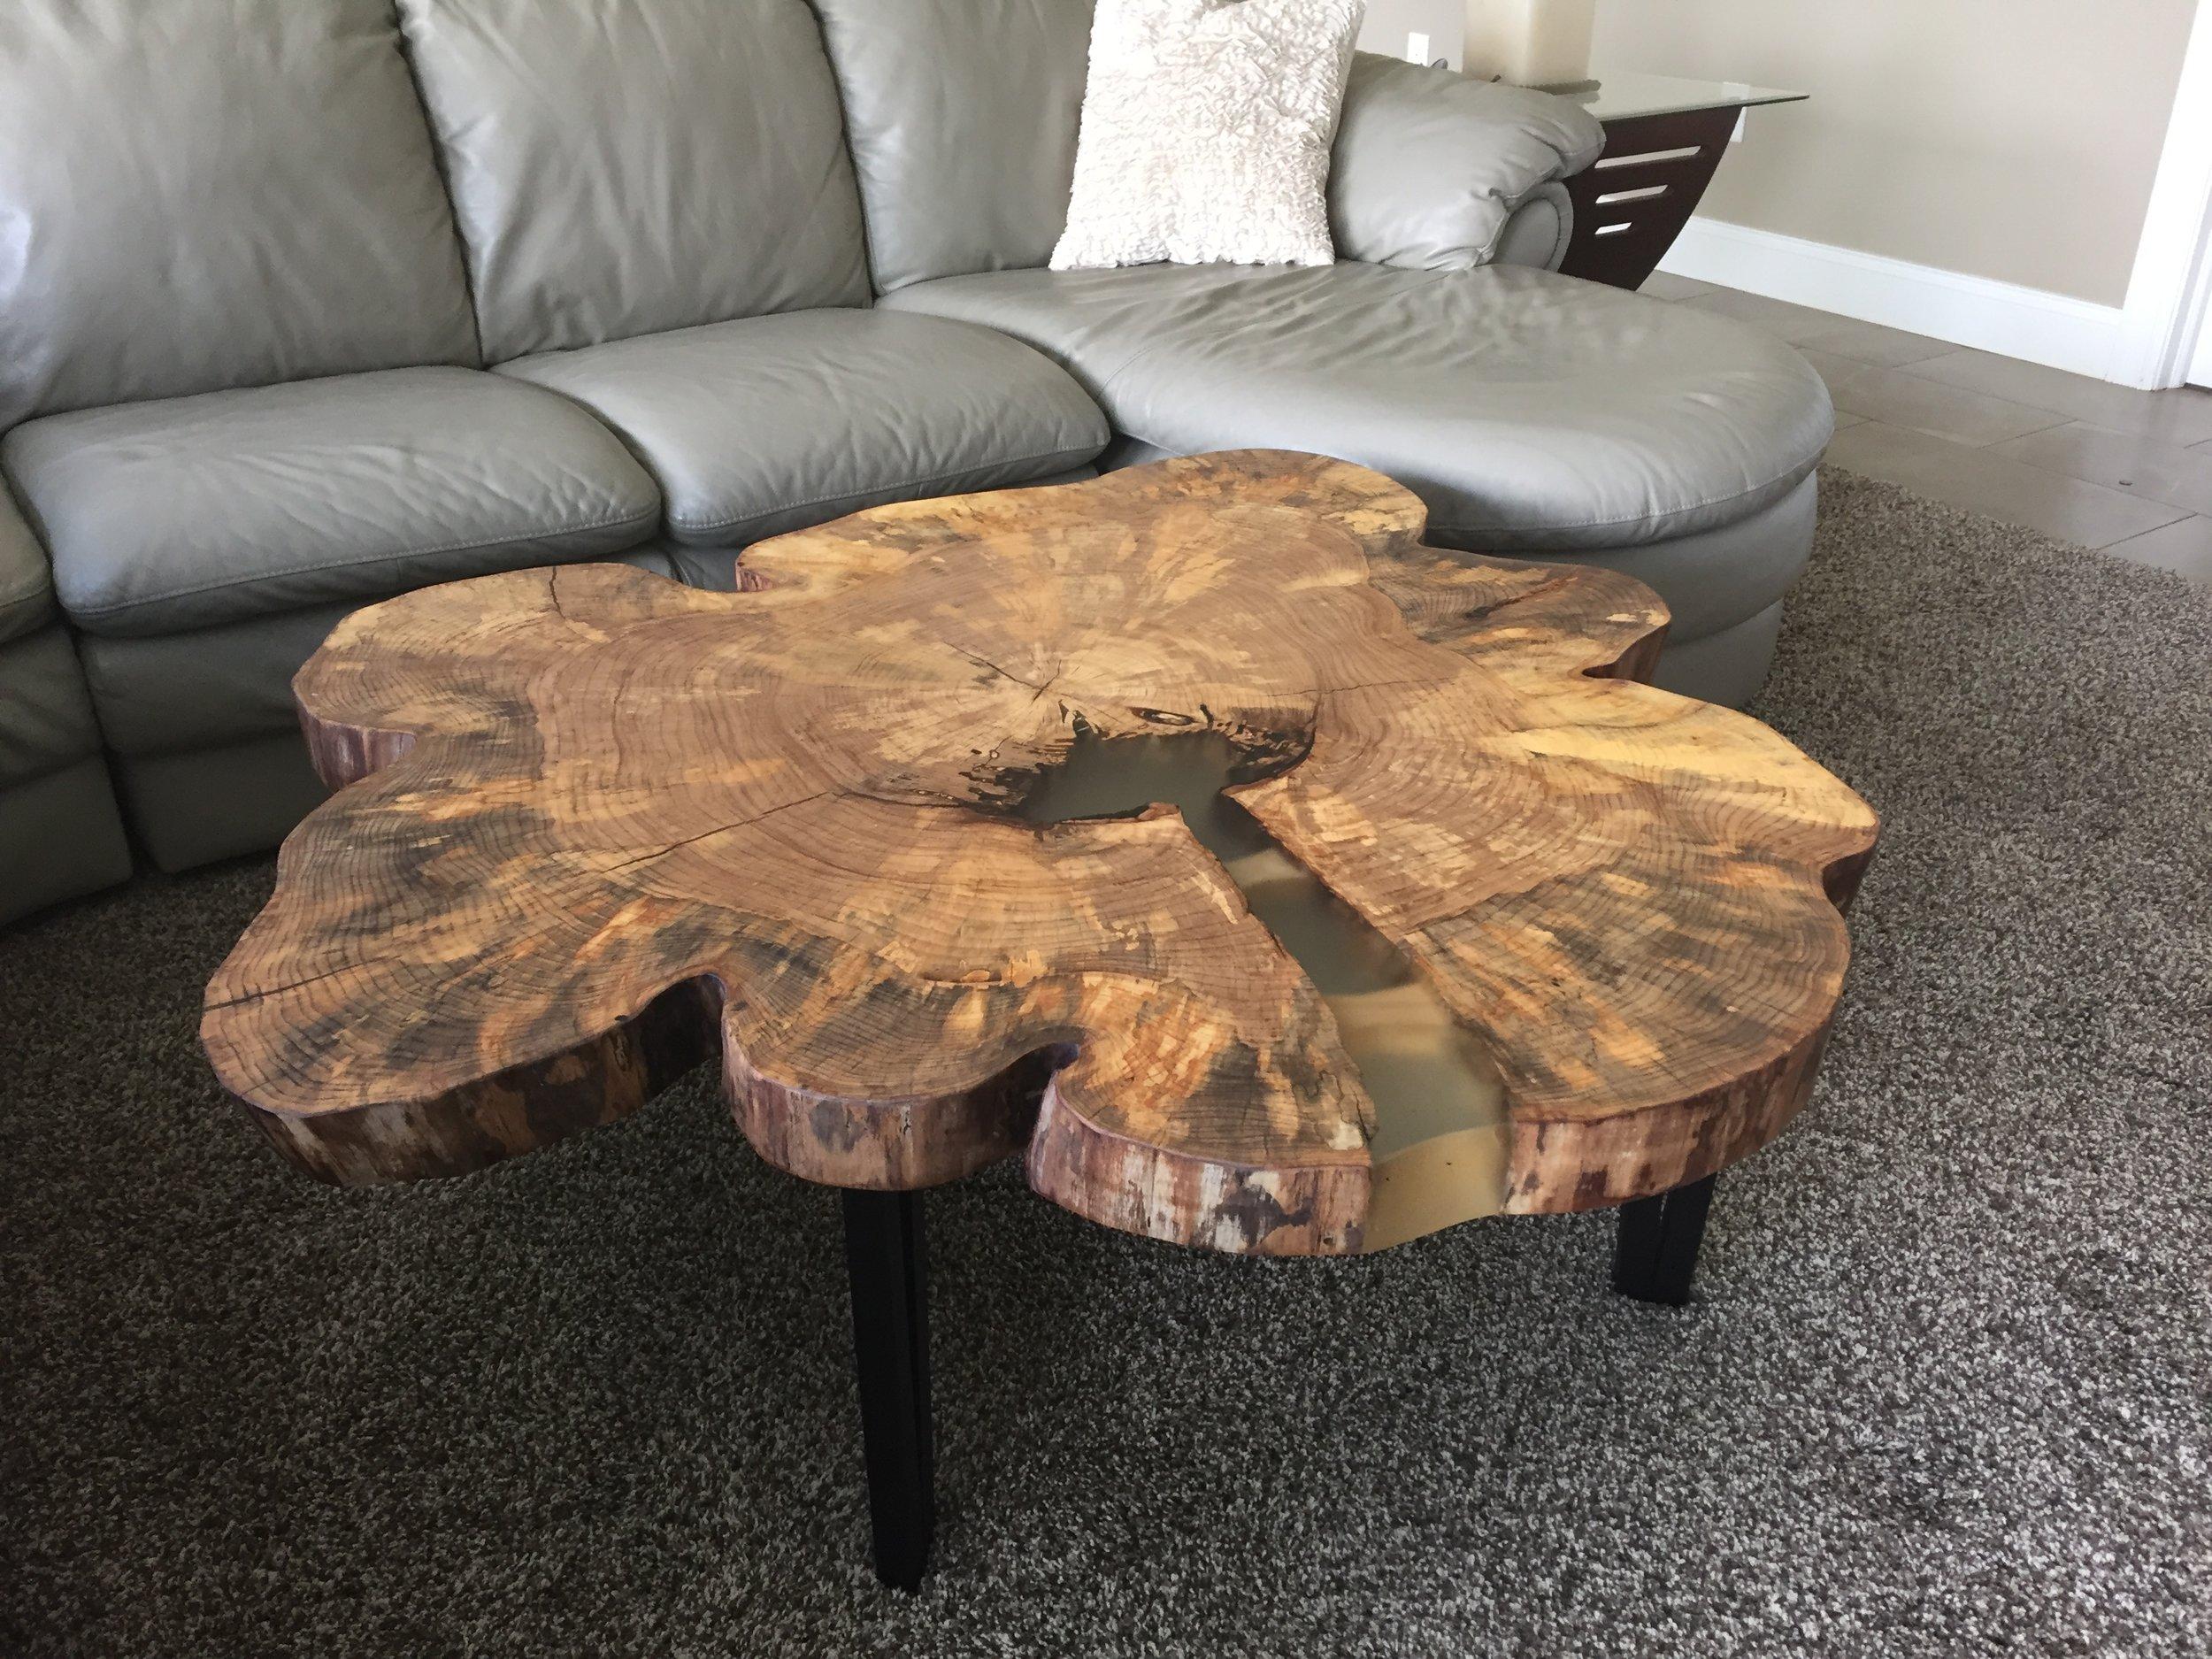 elm round coffee table 360 degree live edge tree purposed detroit michigan live edge slabs reclaimed wood